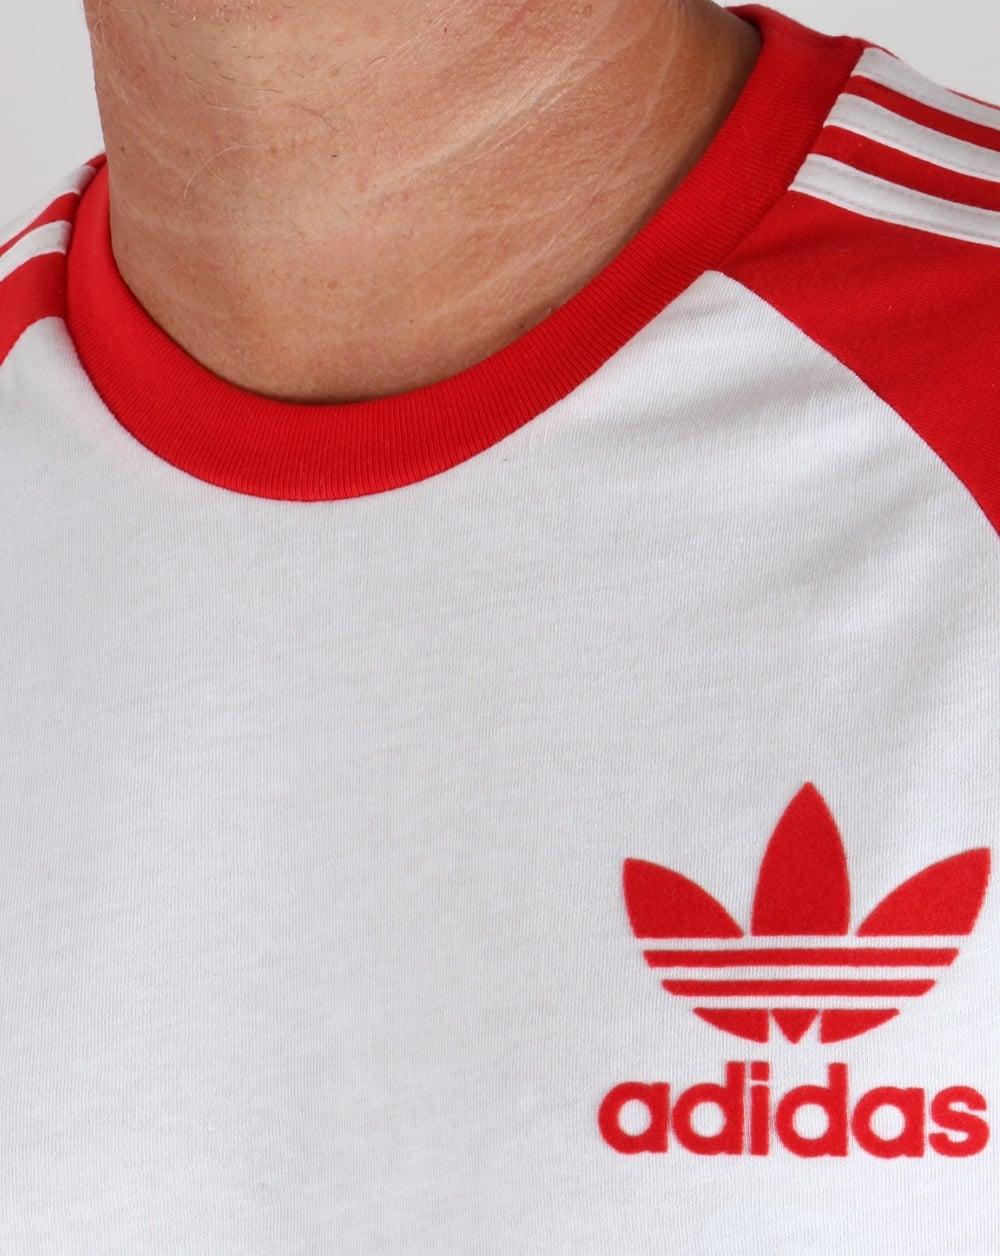 c7296ebbbc5 Adidas Red And White Tee Shirt